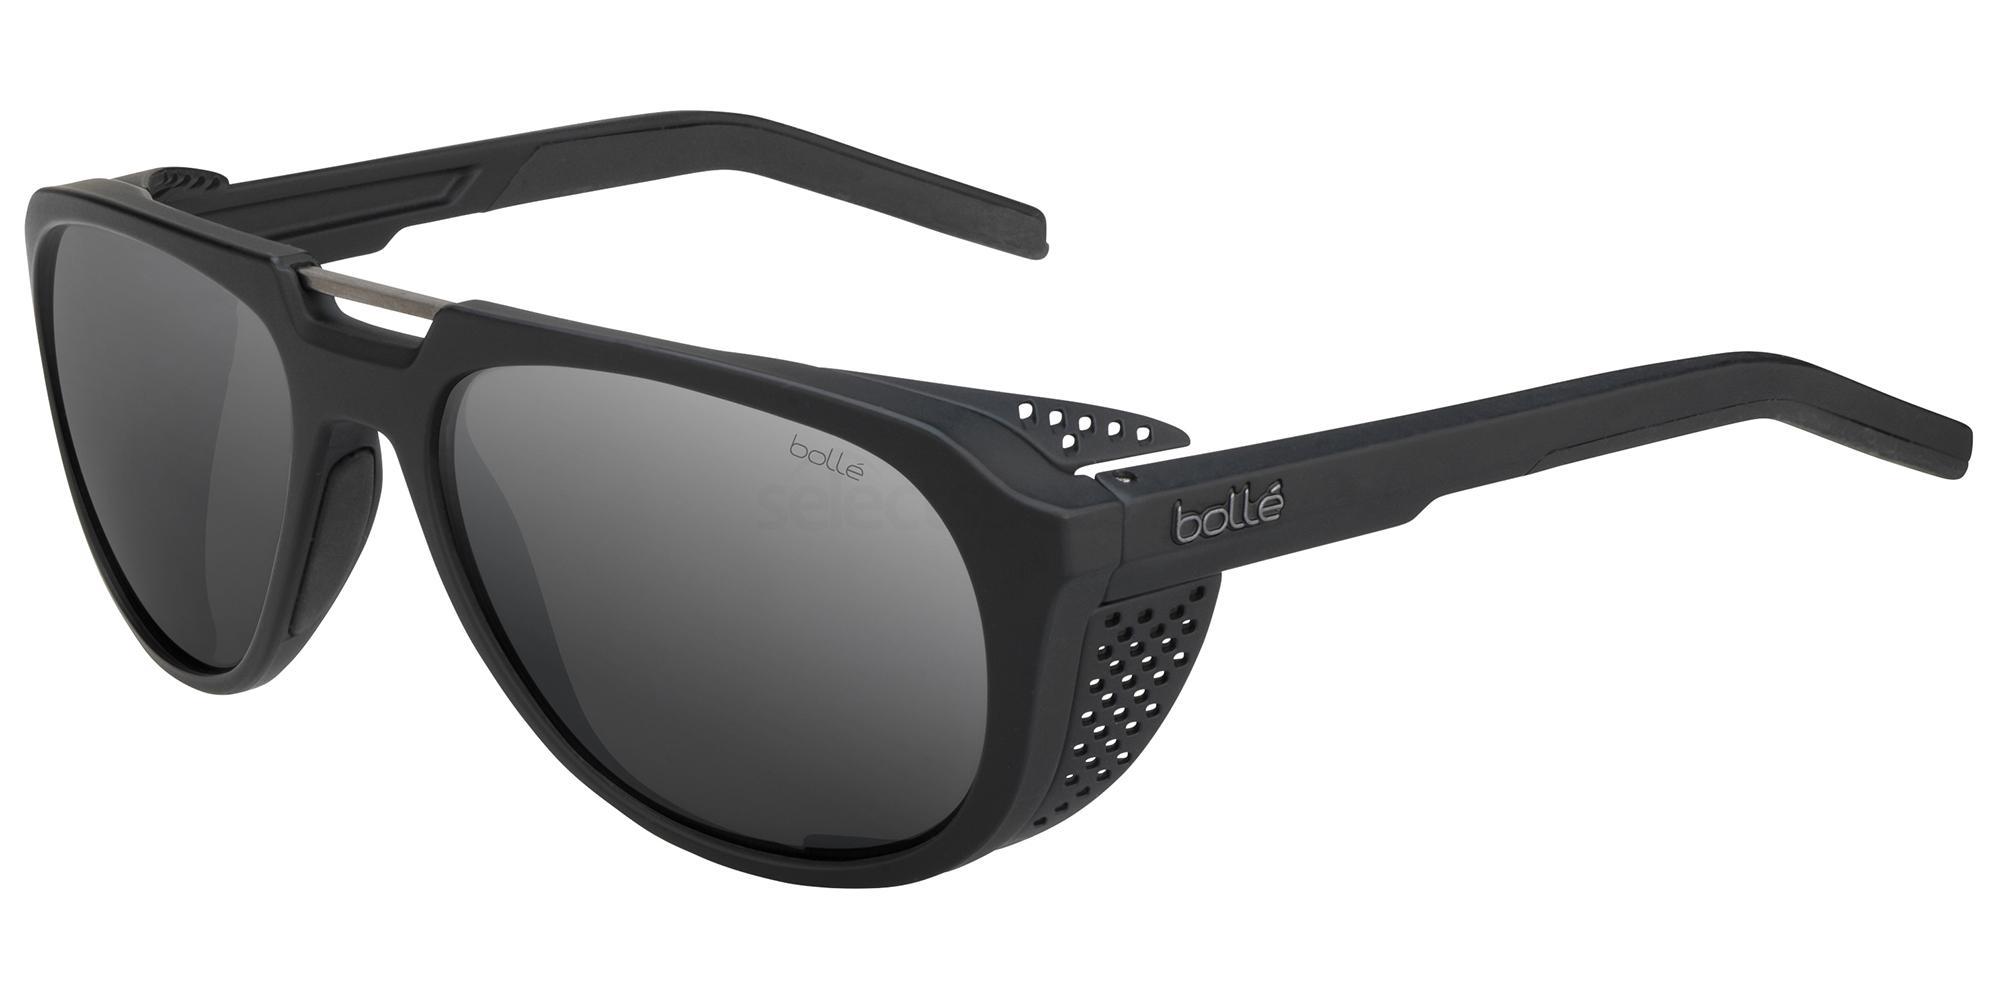 12527 COBALT Sunglasses, Bolle